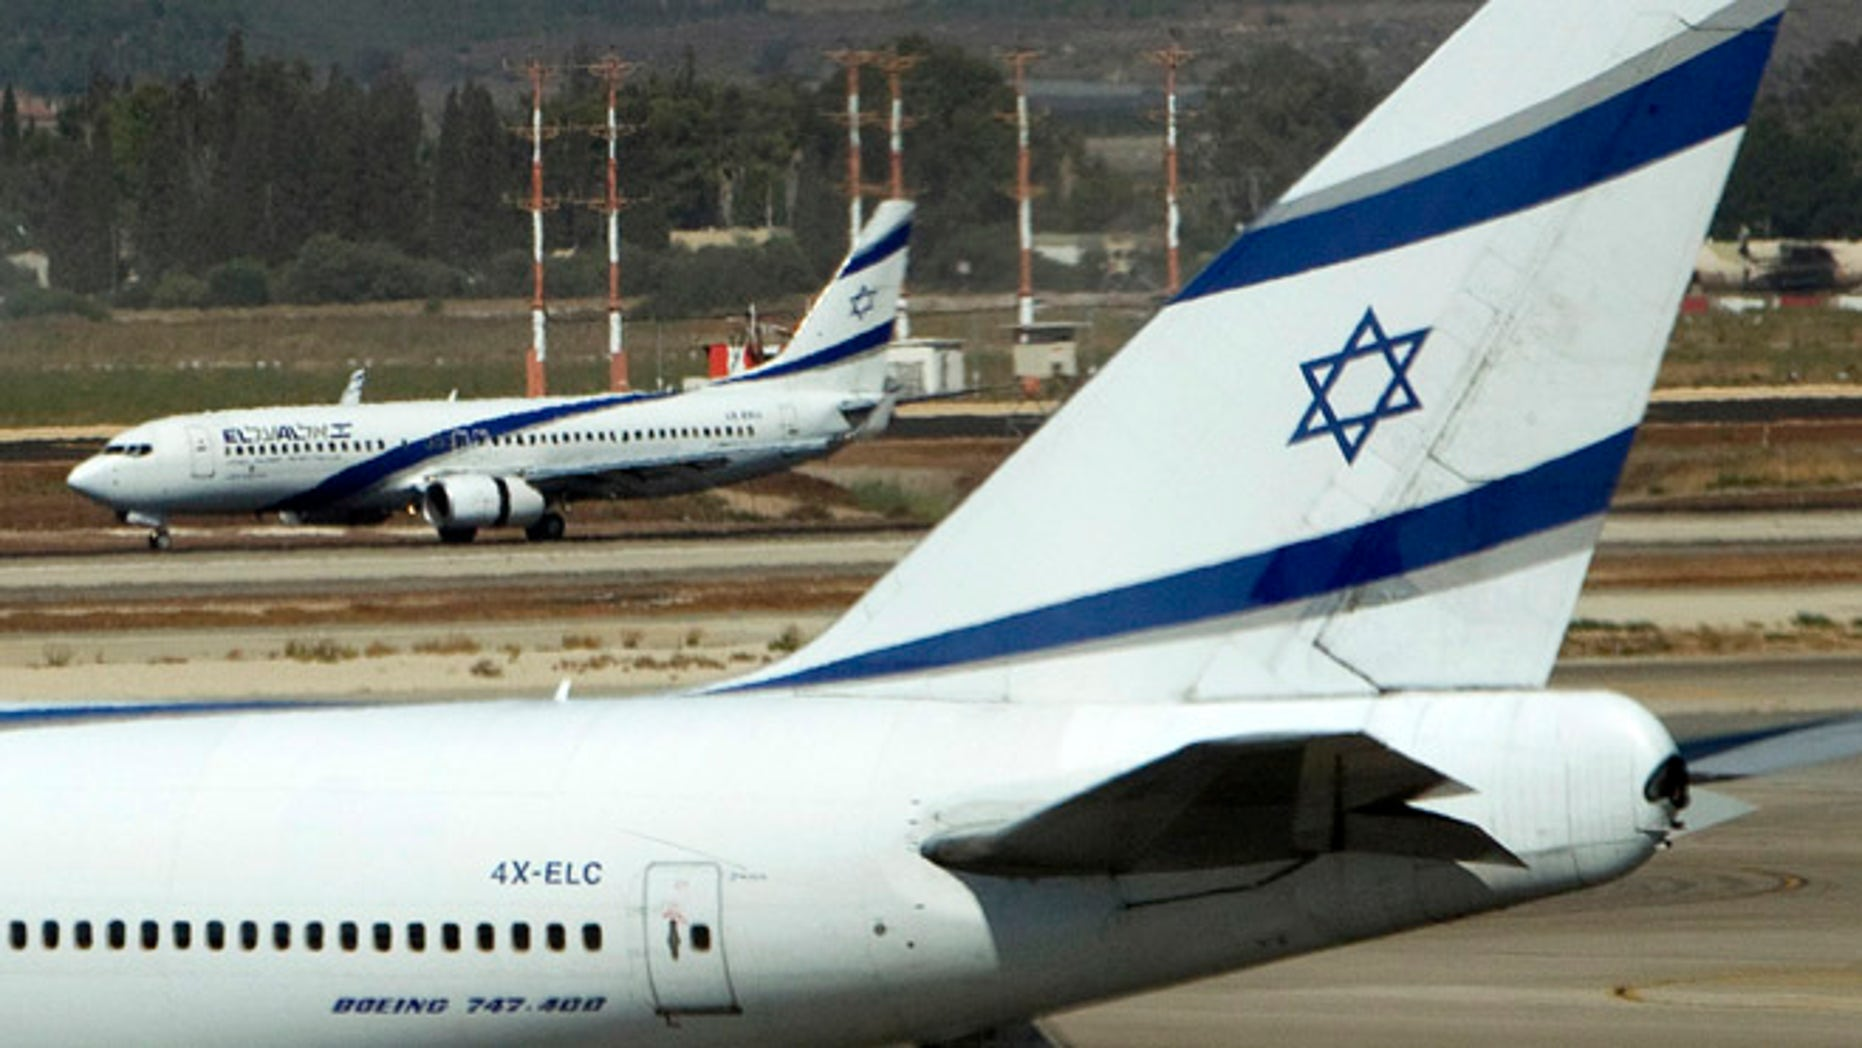 Aug 22, 2011: El Al airplanes are seen on the runway at Ben Gurion International airport near Tel Aviv.